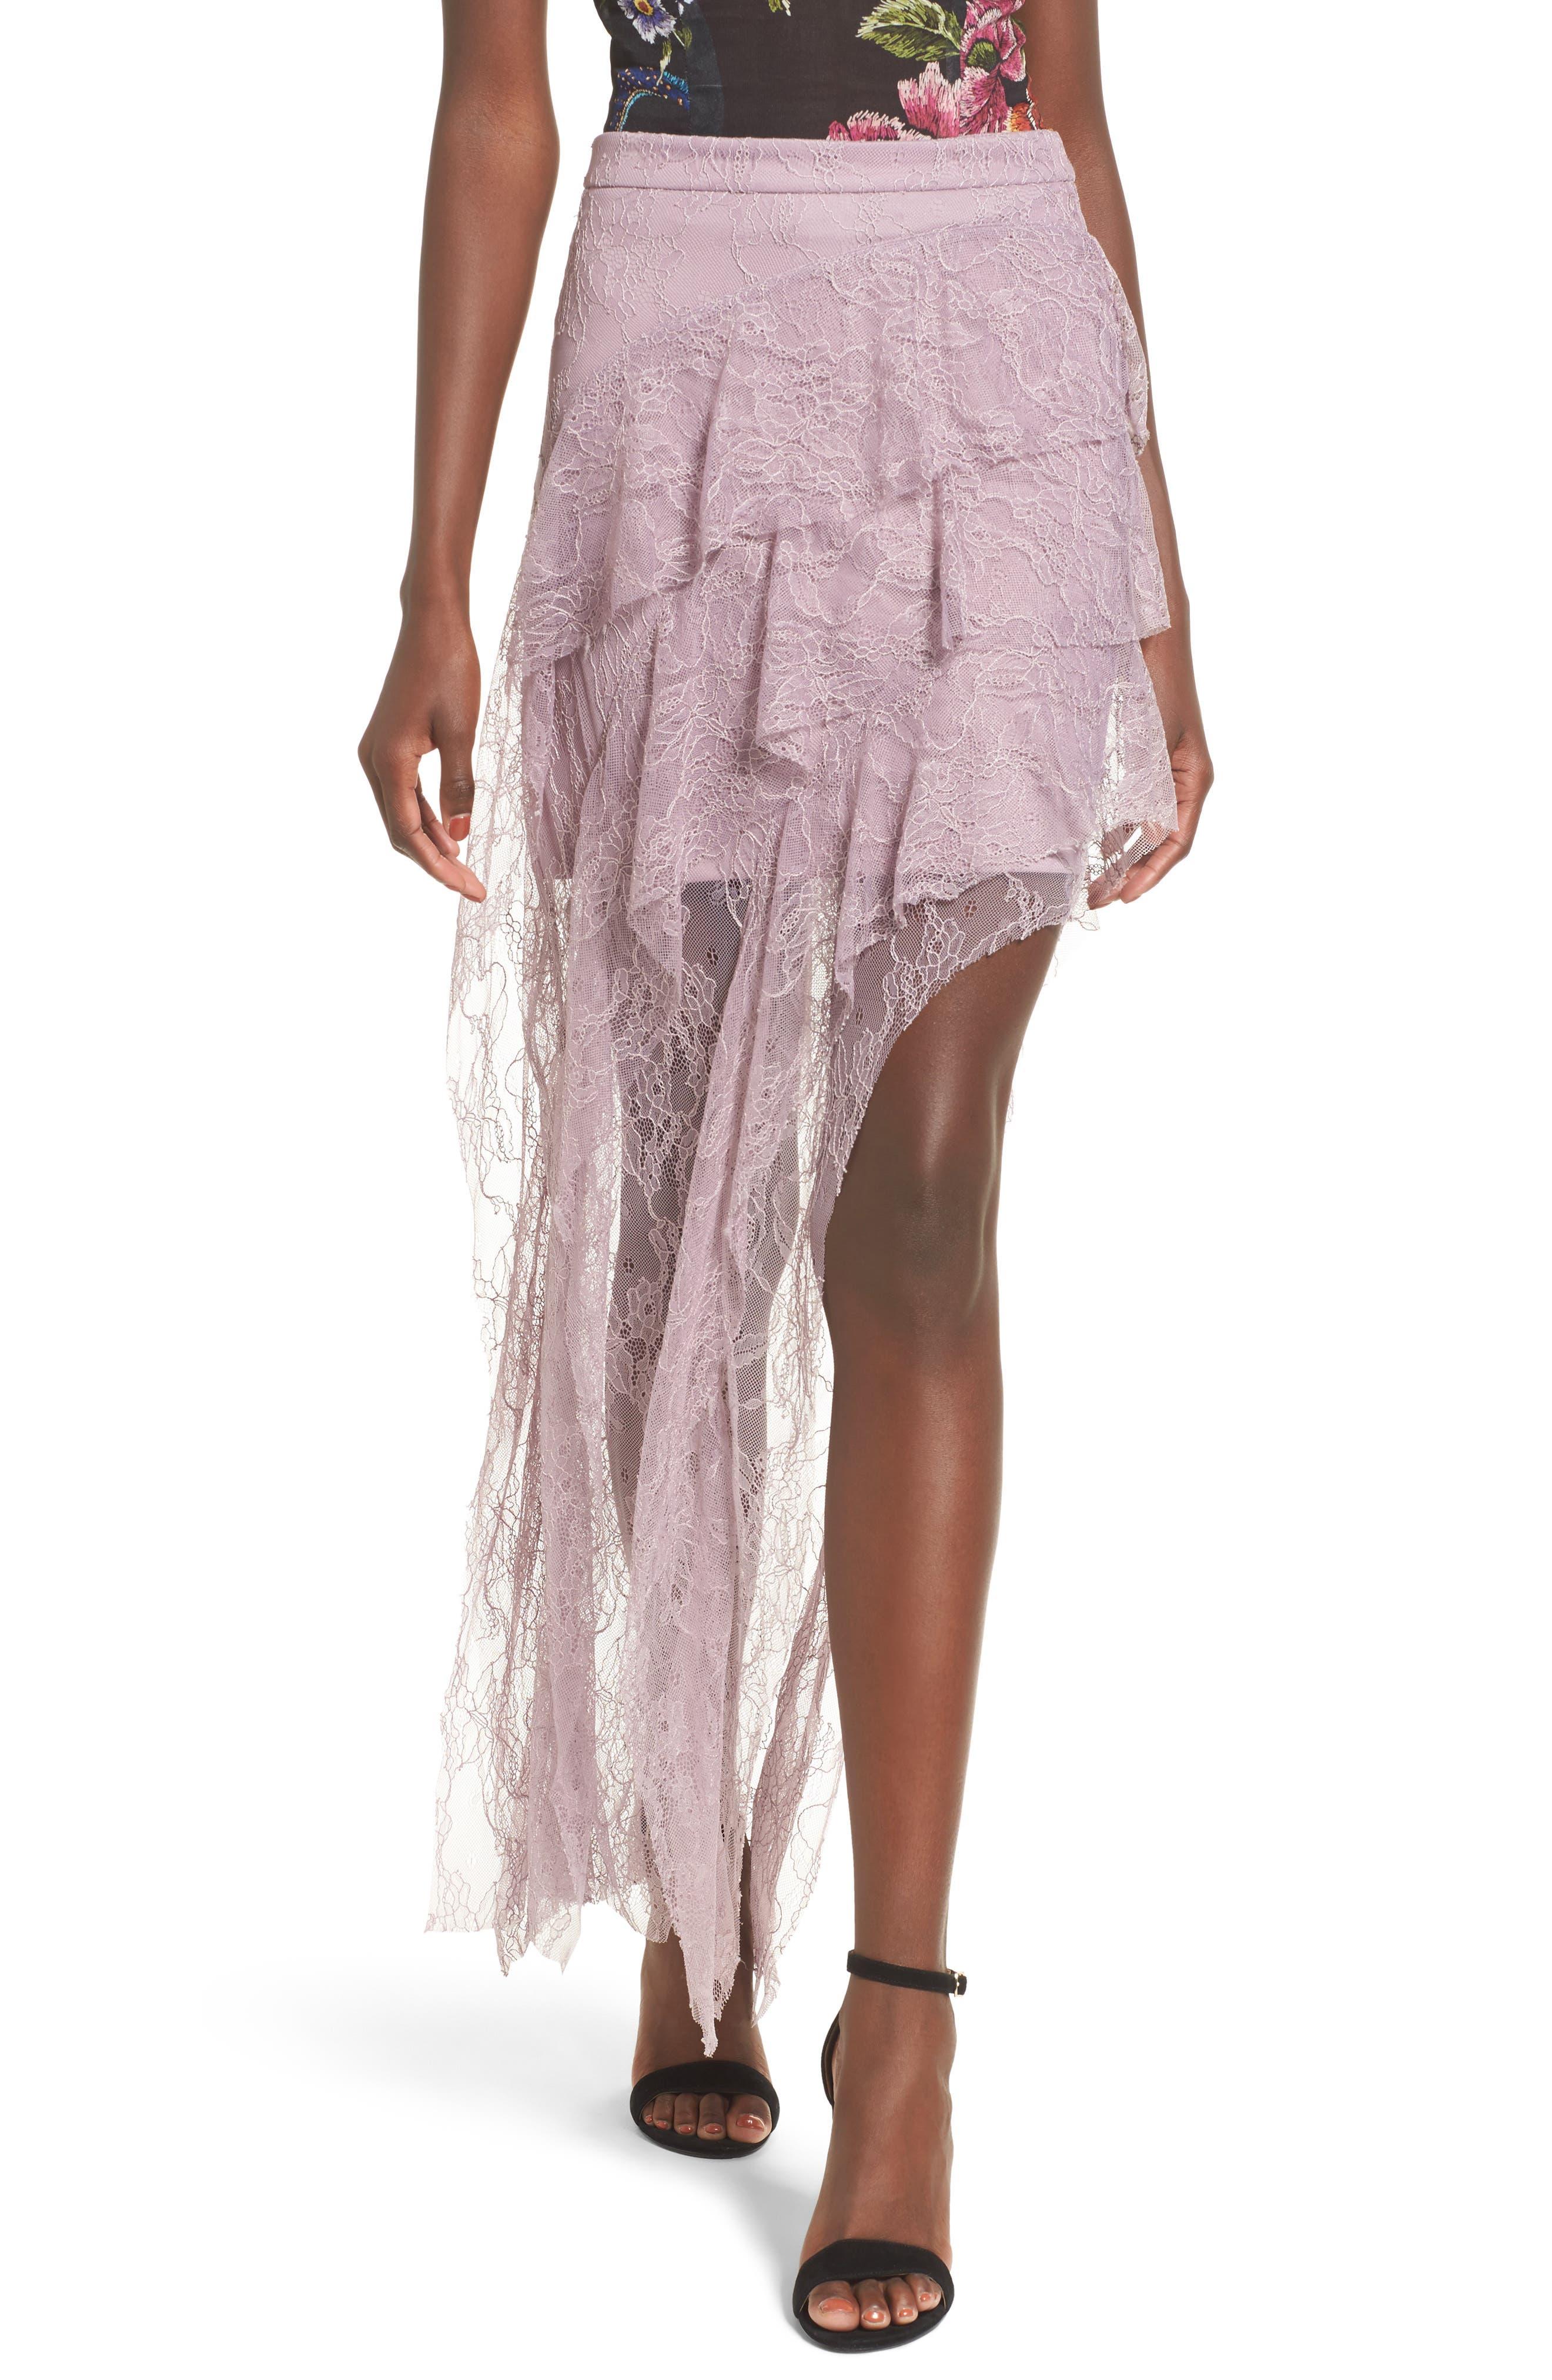 Alternate Image 1 Selected - AFRM Emilia Ruffle Maxi Skirt